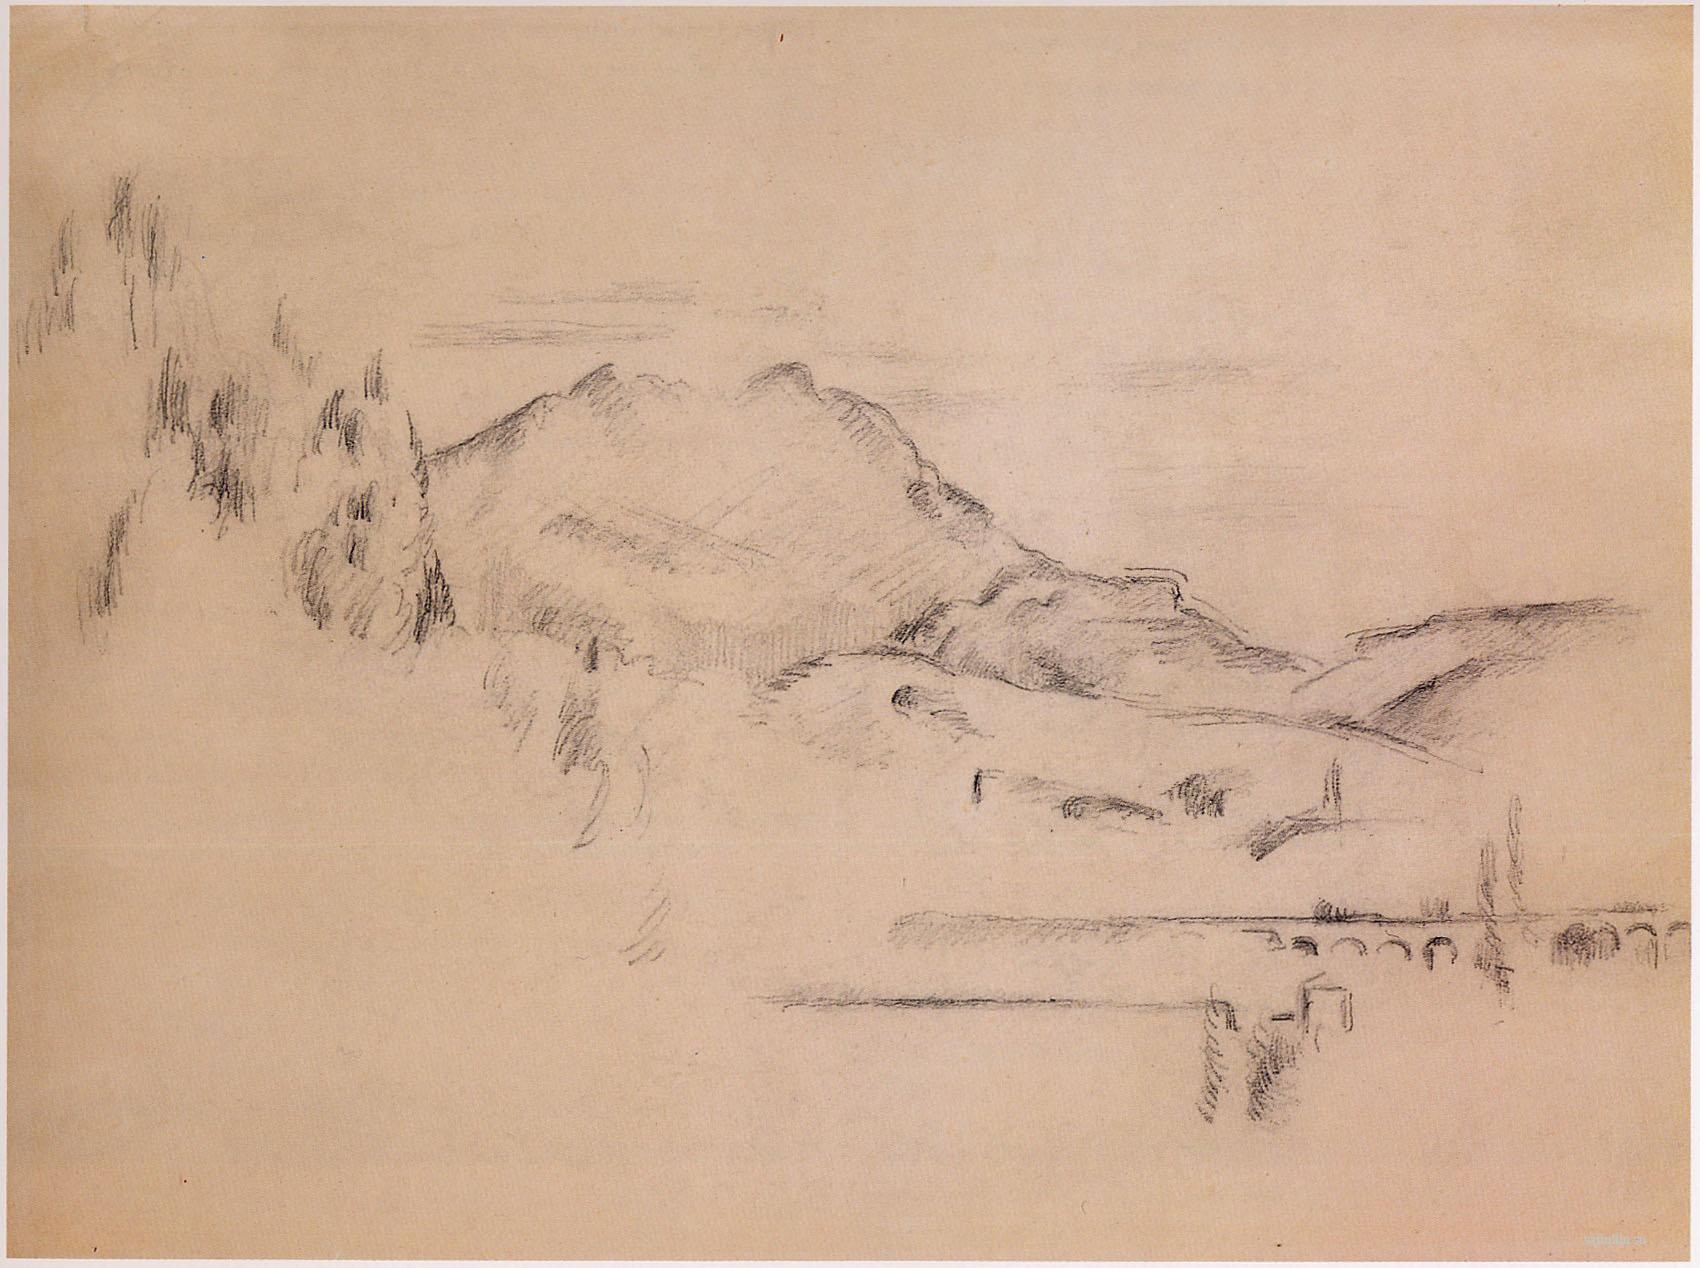 Сезанн рисунок La-Montagne Sainte-Victoire пейзажи природы Сафиуллин